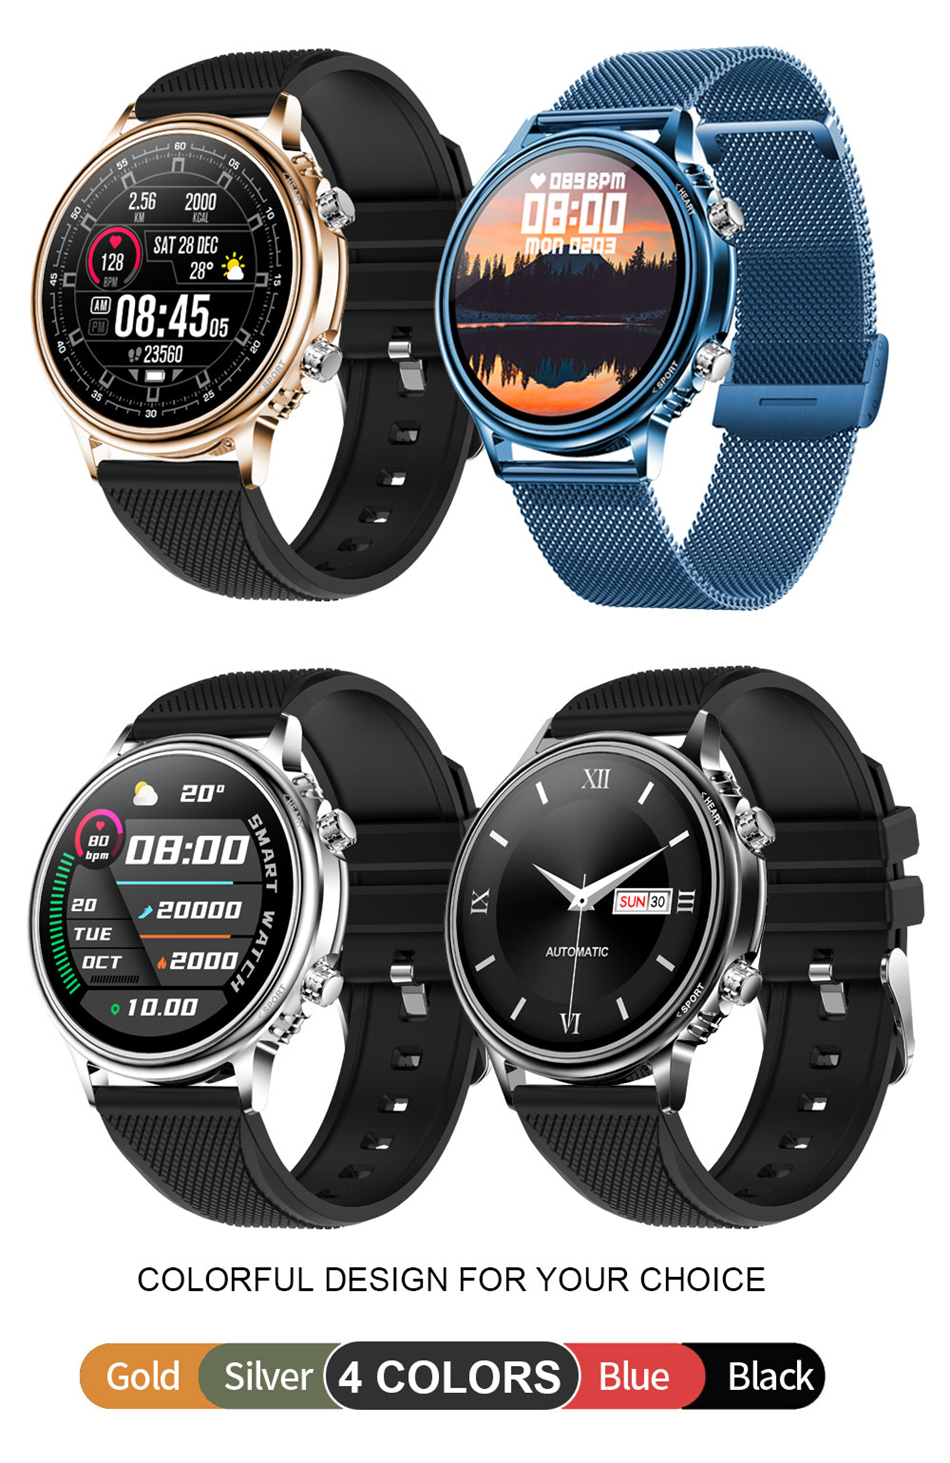 Hbfbb6ec61547475f951585e7370fd6d6M LIGE New Smart Watch Men Custom Dial Full Touch Screen Waterproof Smartwatch For Android IOS Sports Smart watch Fitness Tracker